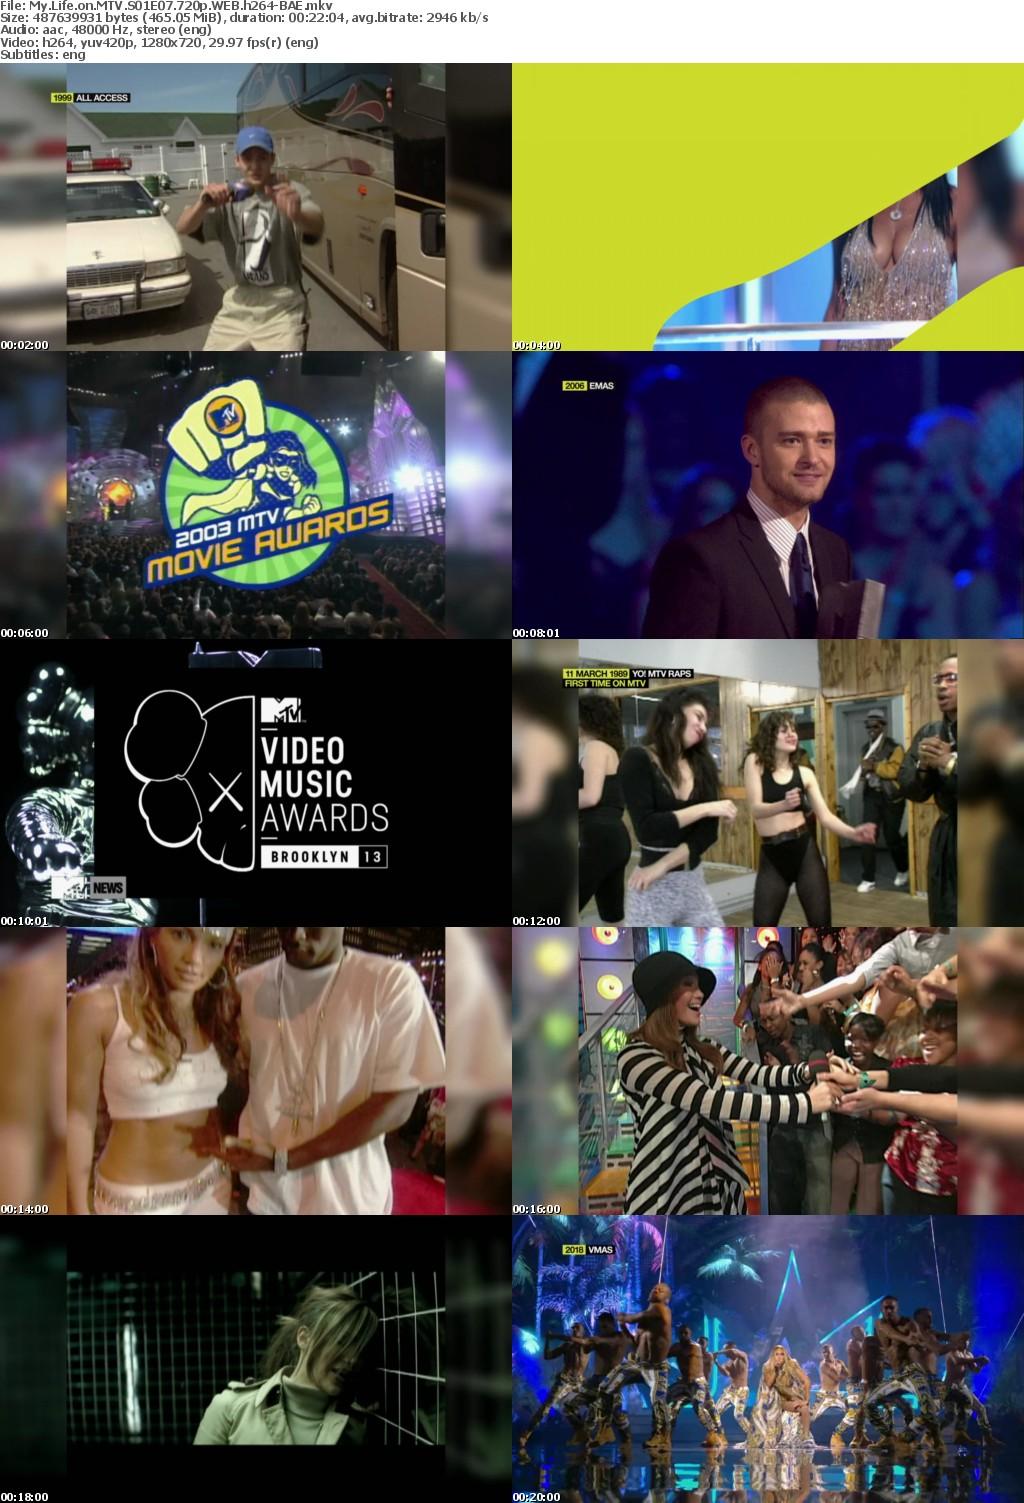 My Life on MTV S01E07 720p WEB h264-BAE